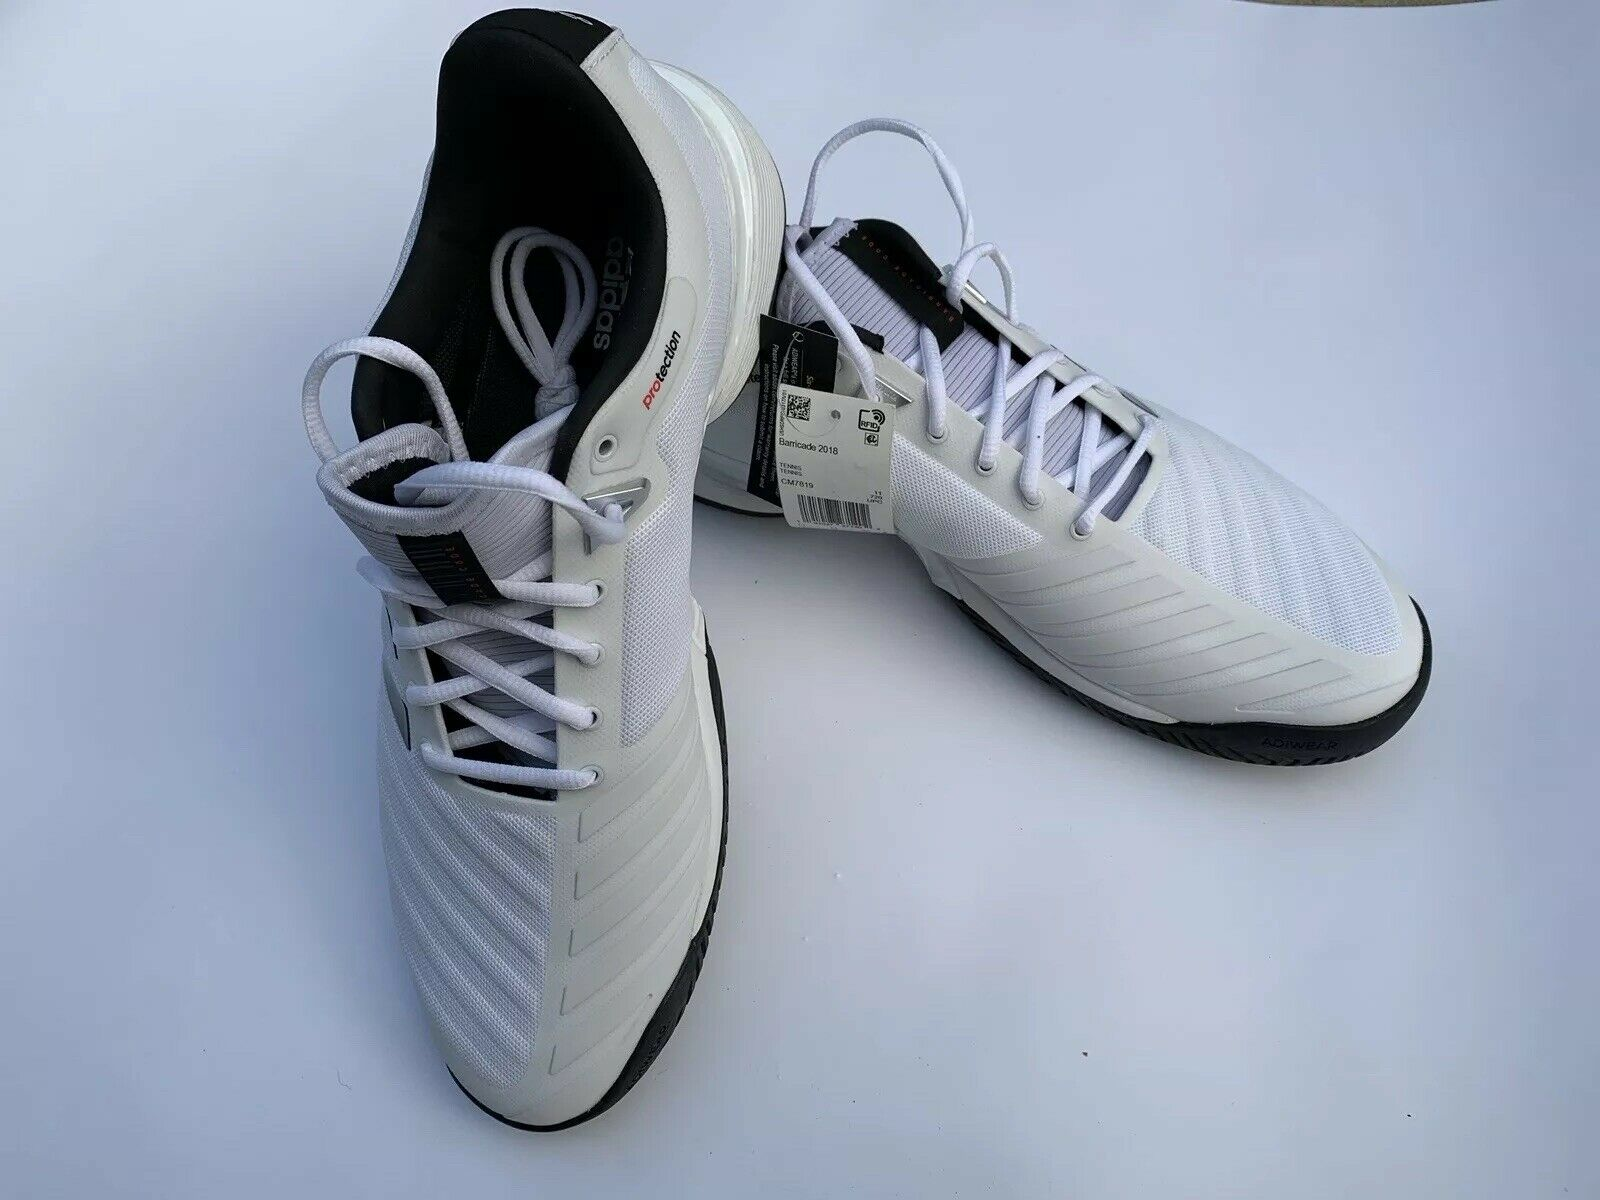 Adidas Barricade 2018 Men's Tennis shoes 11.5 US NWT